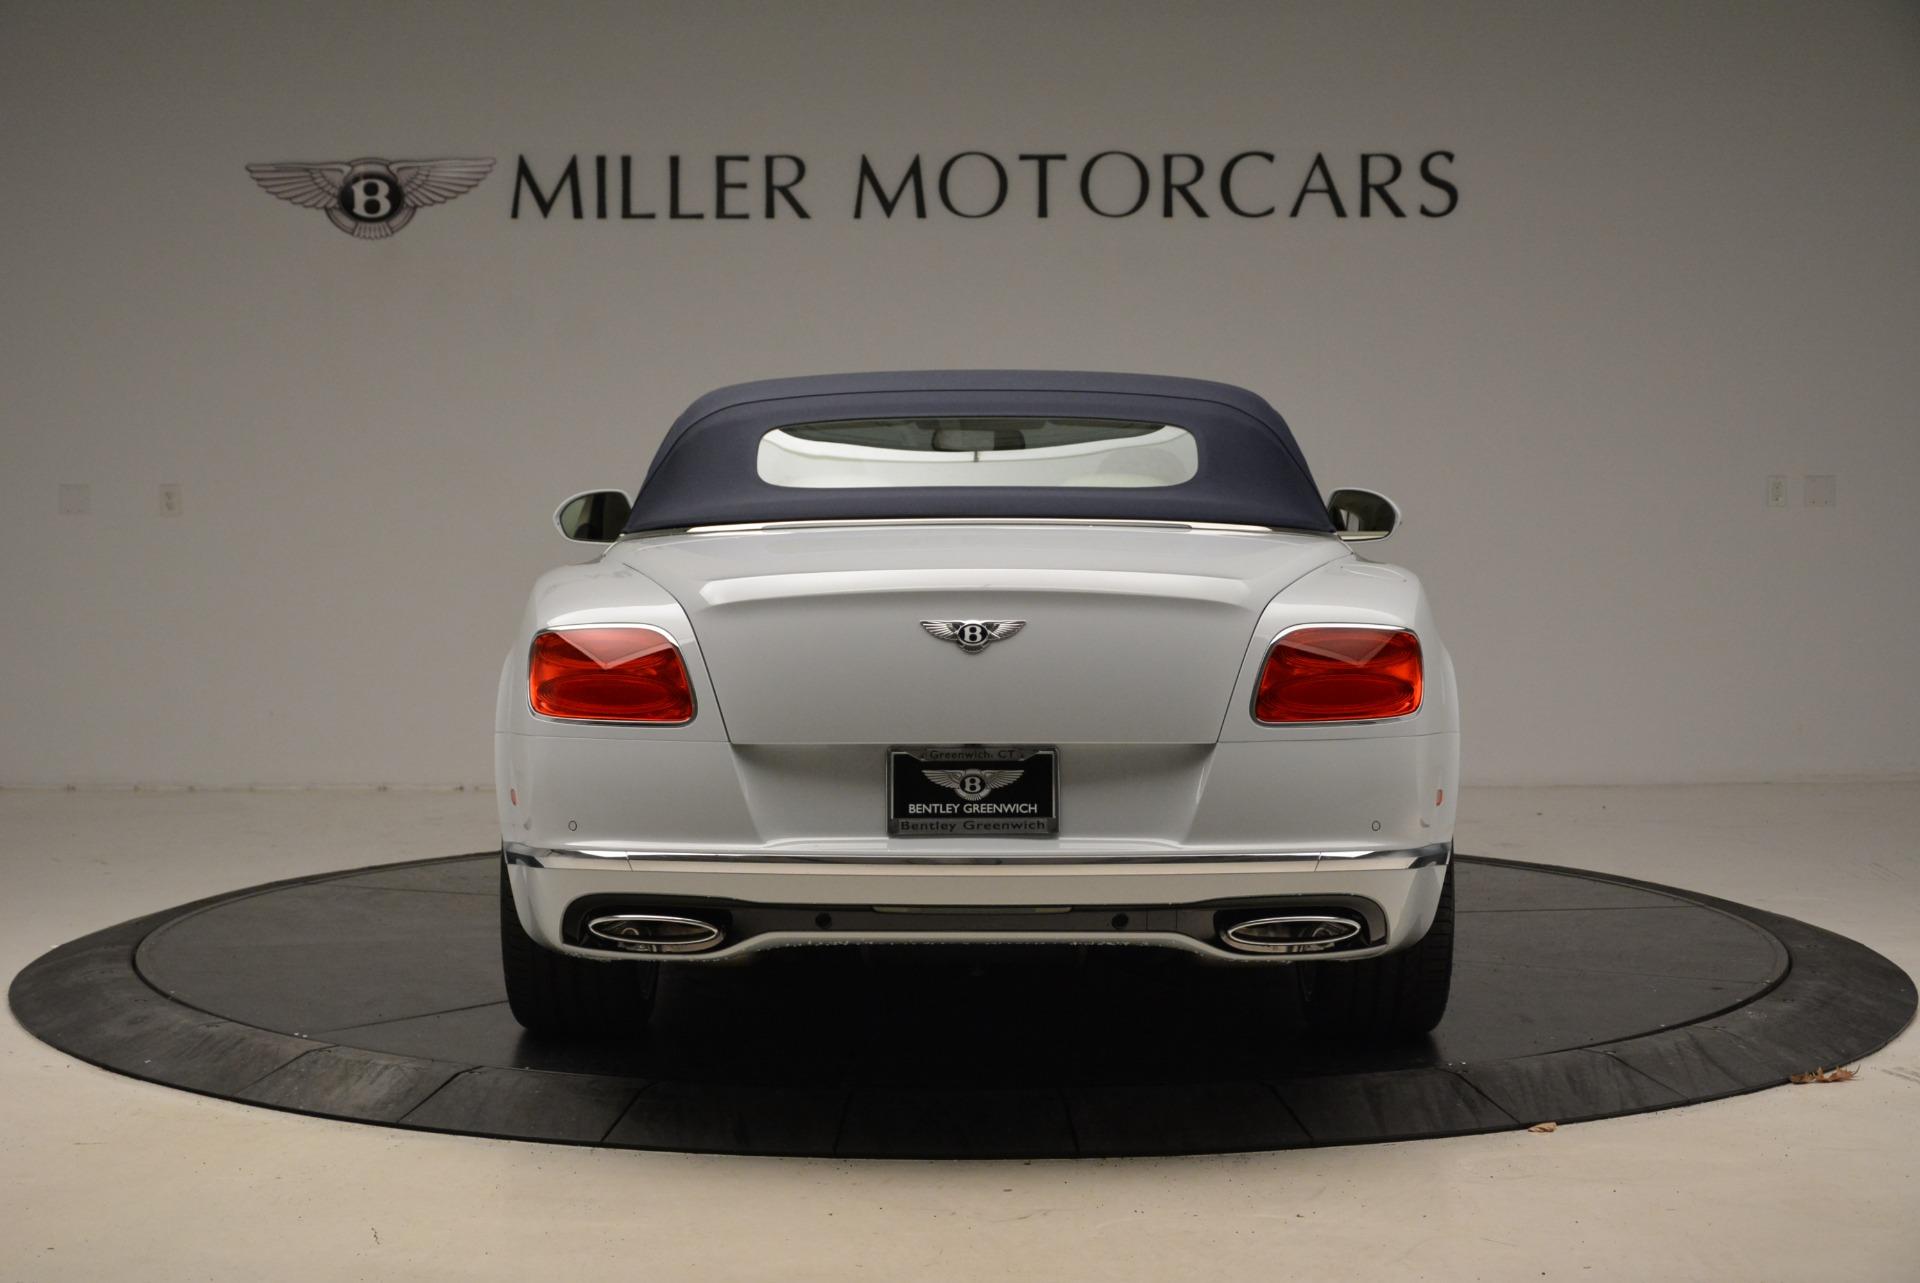 New-2018-Bentley-Continental-GT-Timeless-Series